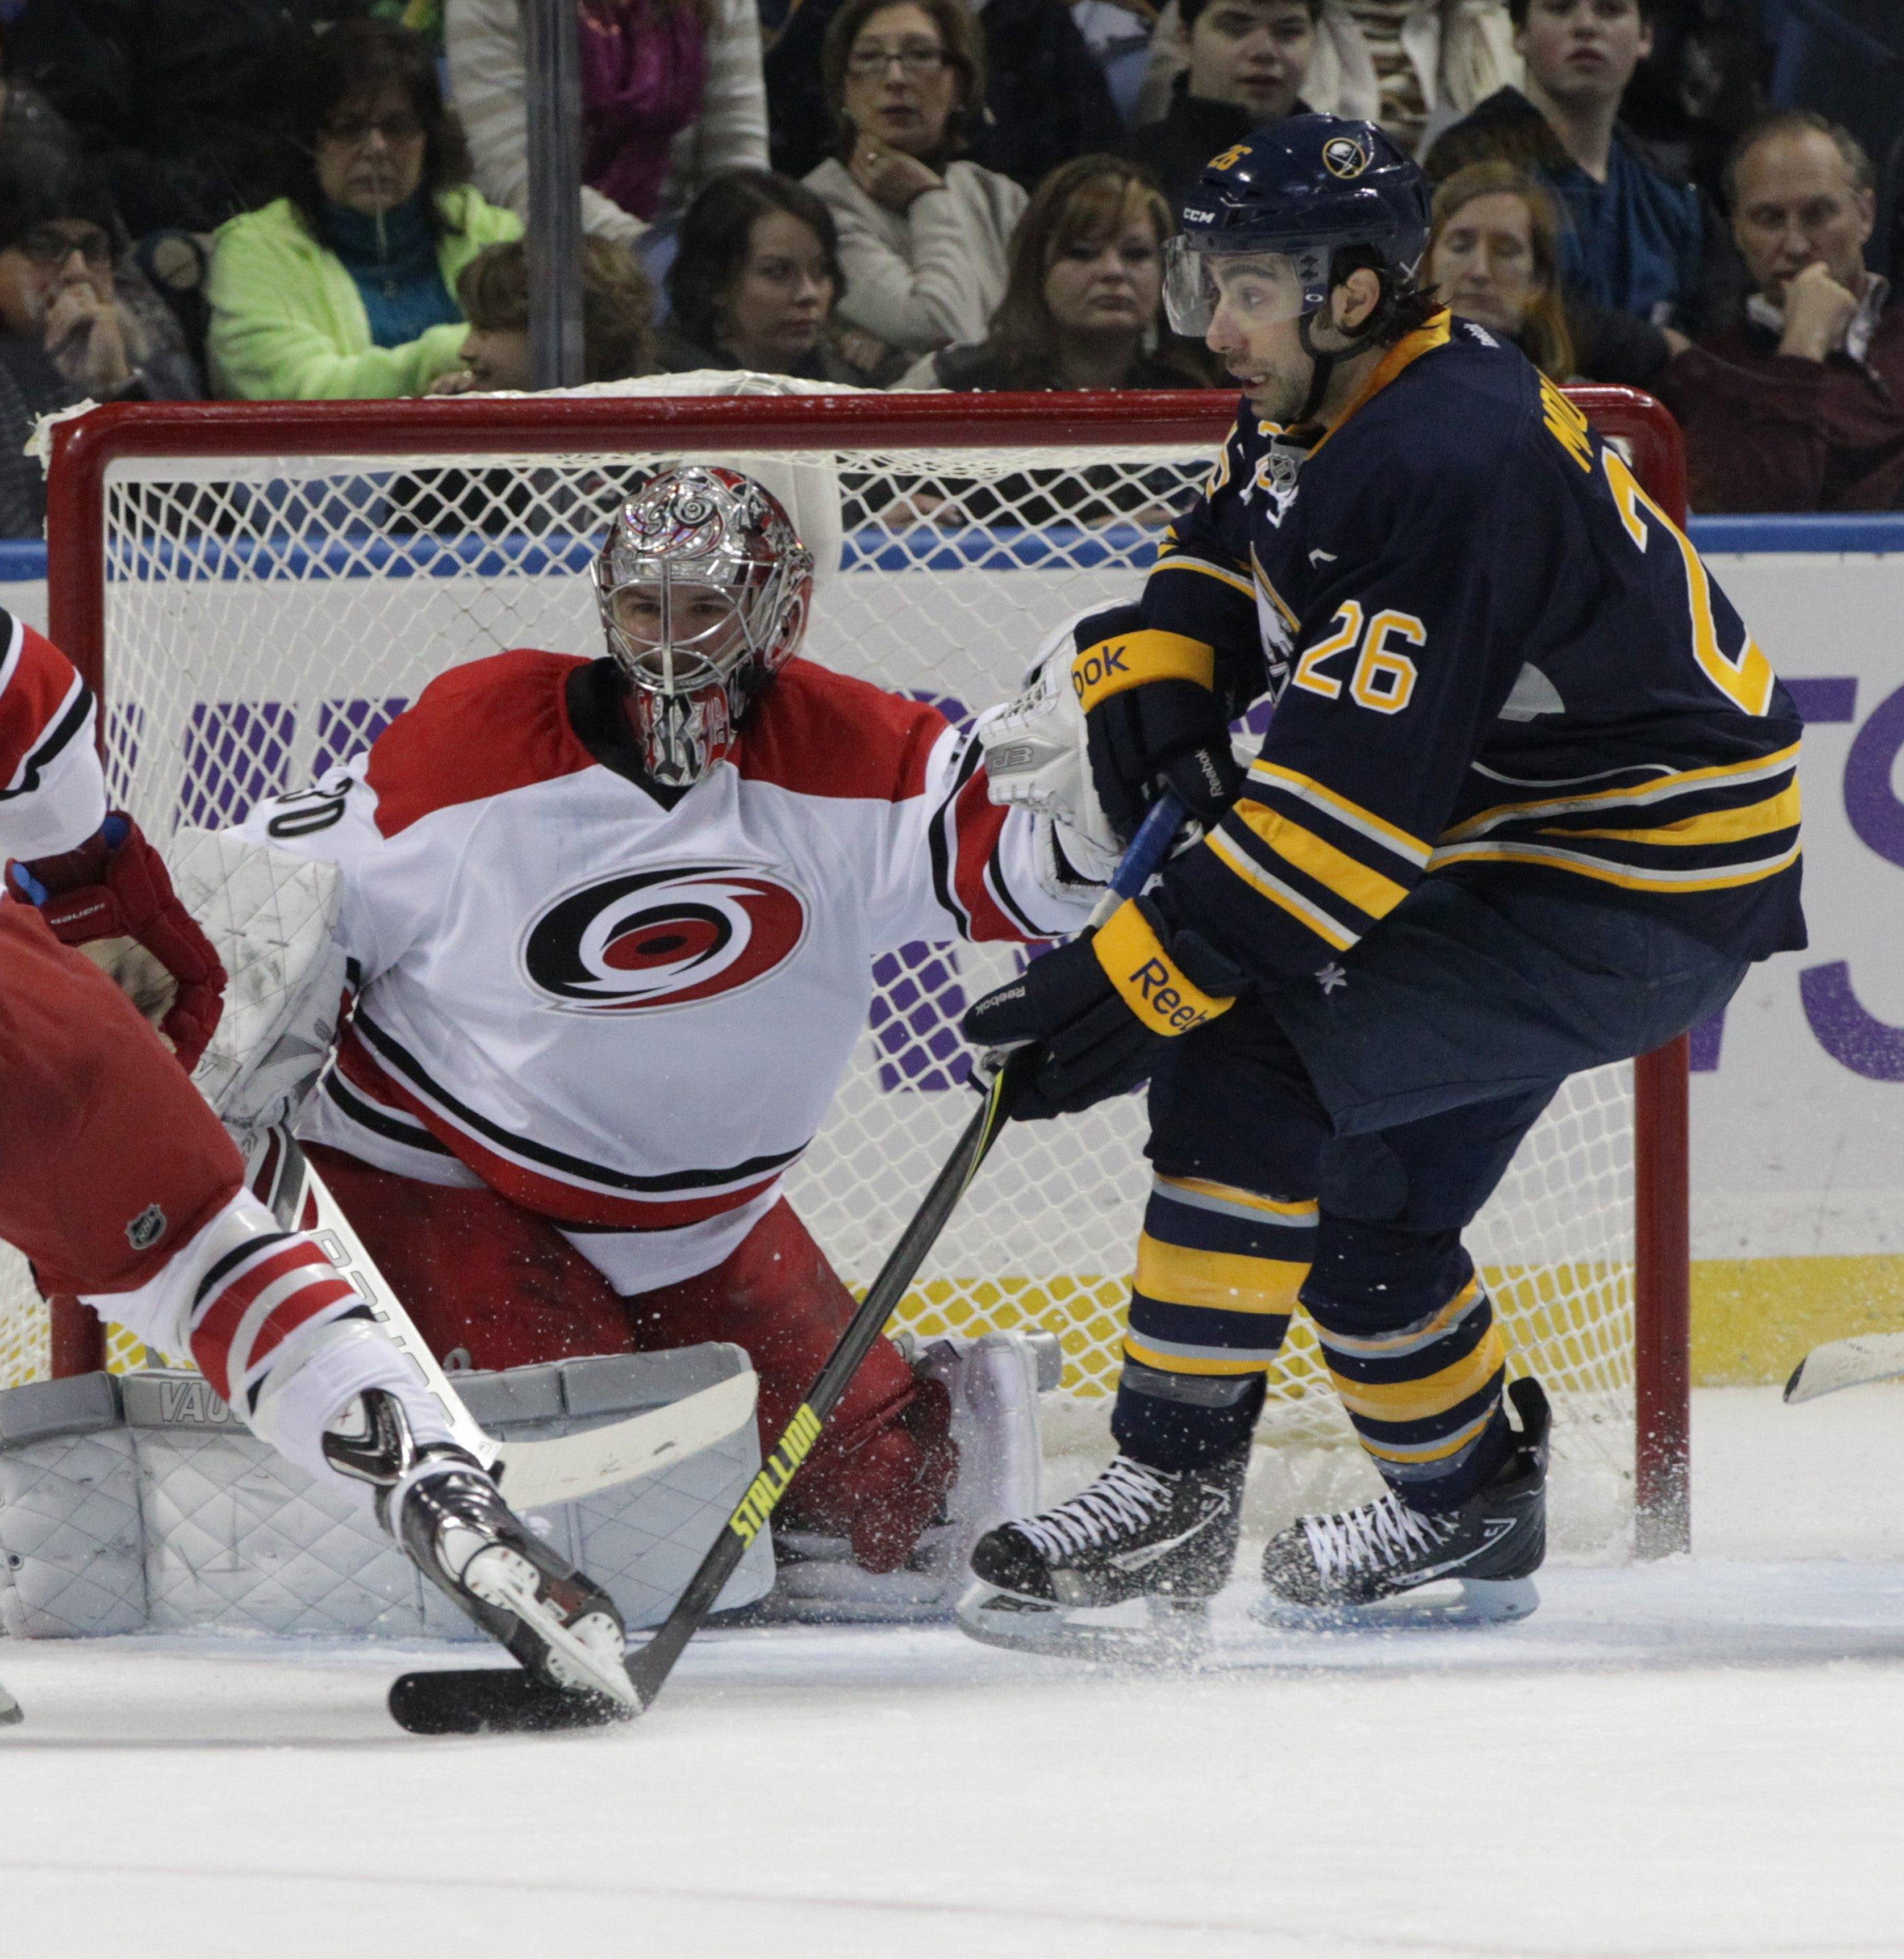 Buffalo's Matt Moulson (26) looks for the puck in front of Carolina goaltender Cam Ward.